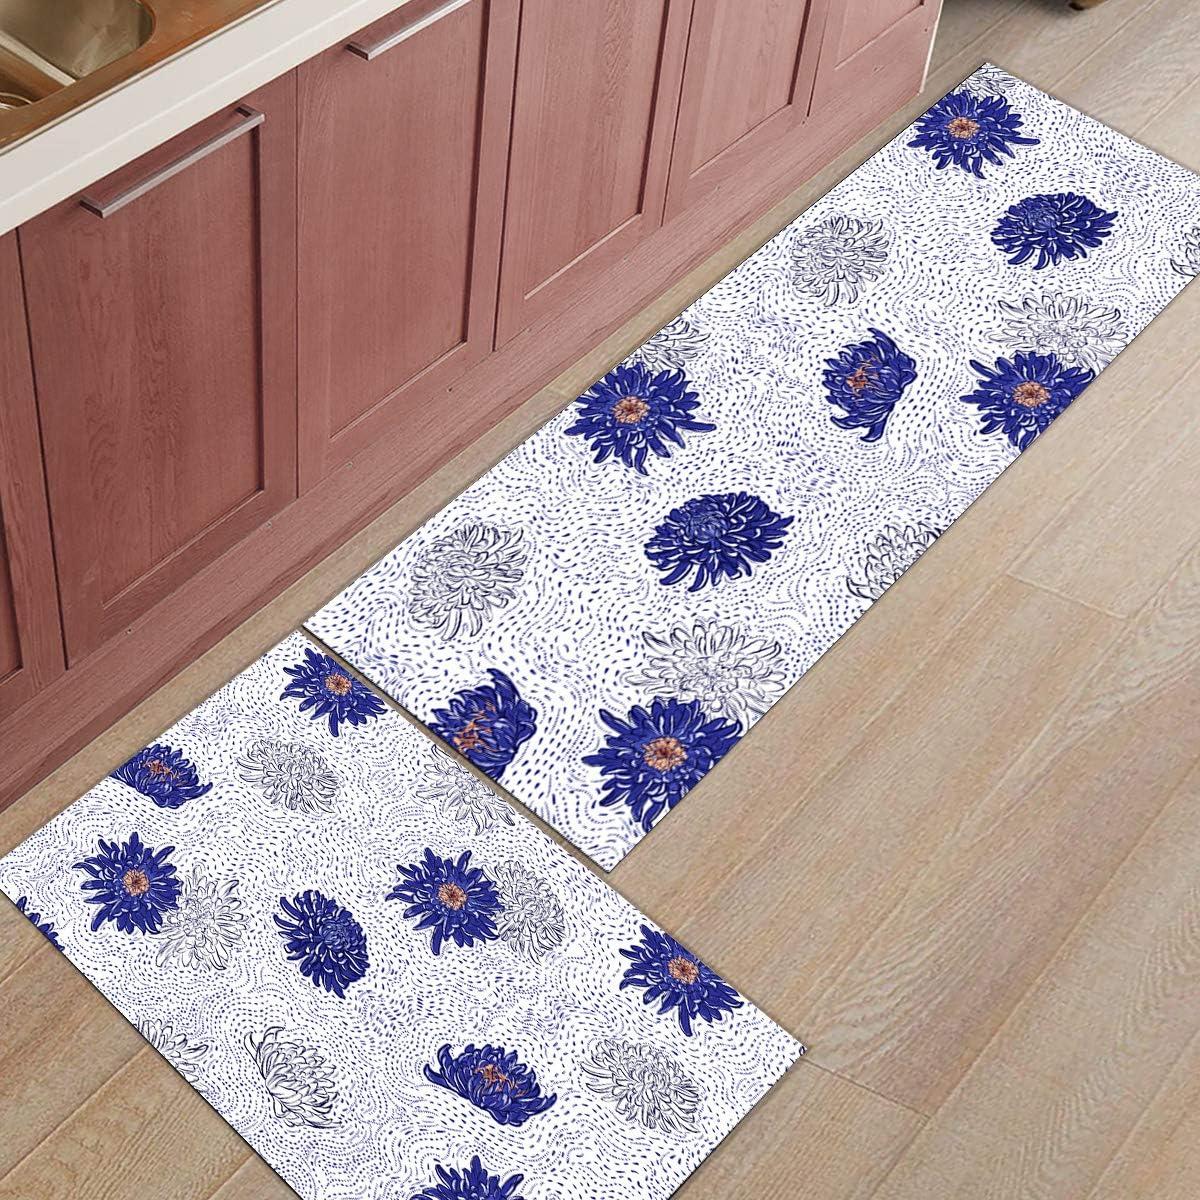 Chrysanthemum Hand Painted Runner Rug 5 popular Slip with shopping Rugs Non Floor